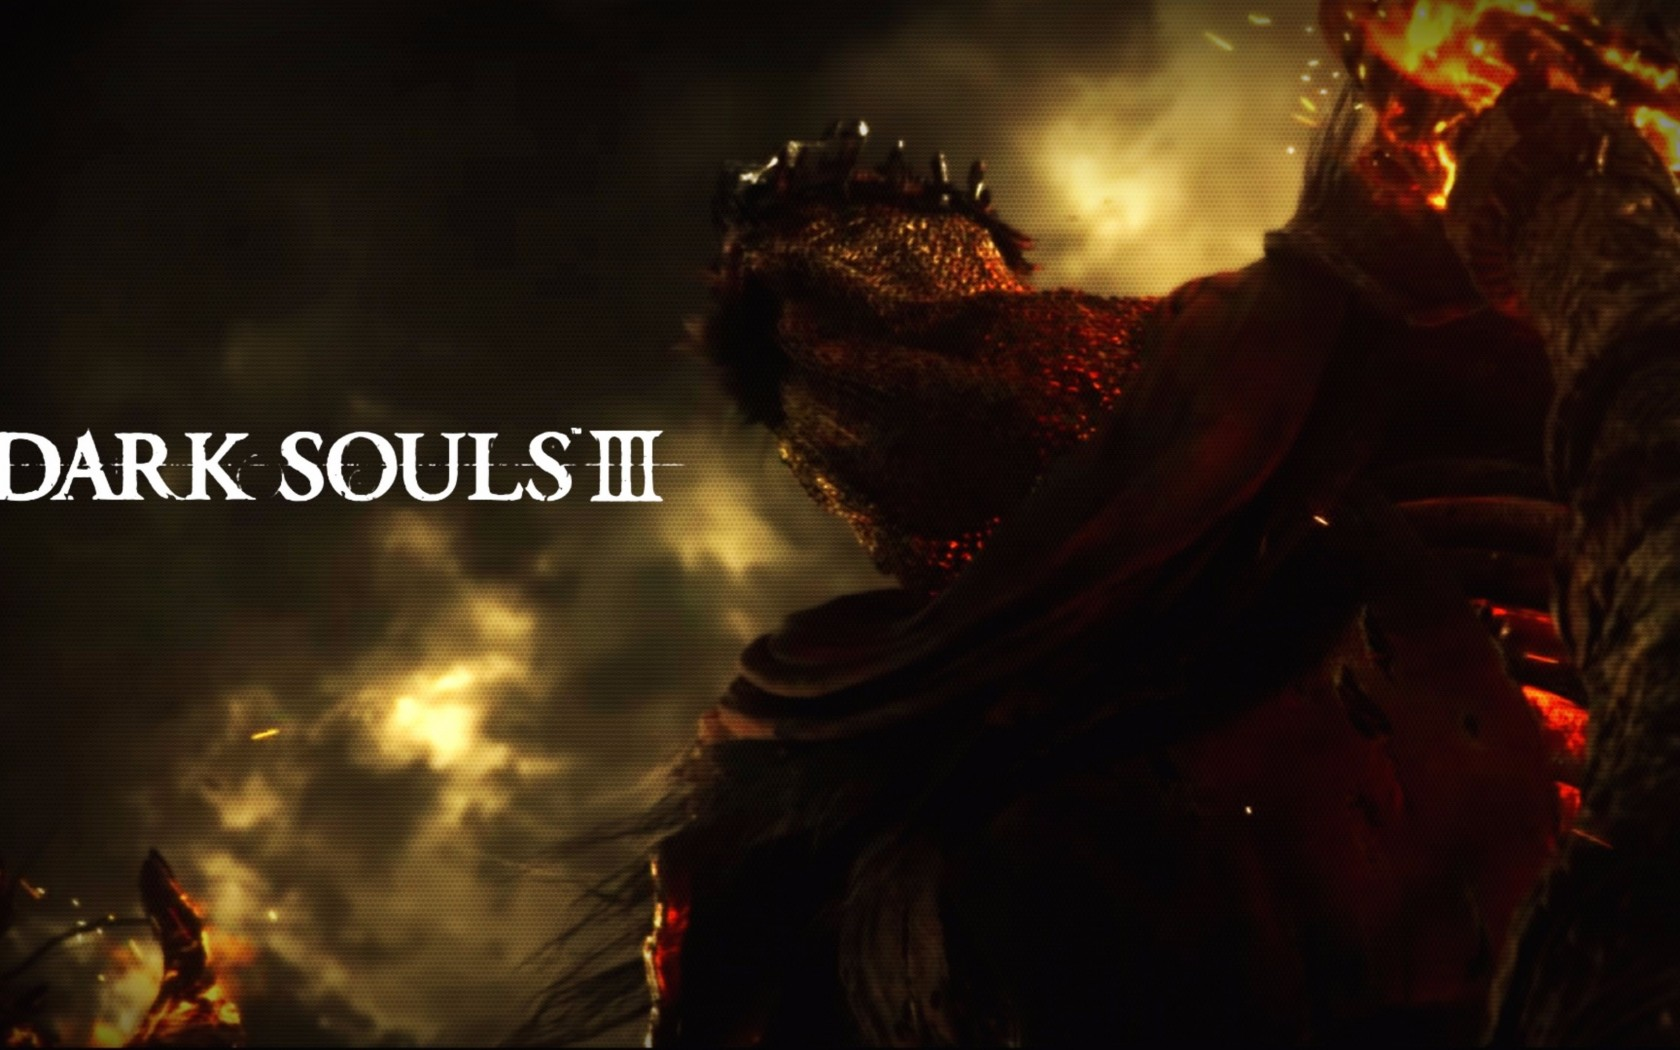 Download Dark Souls 3 4K Wallpapers 4K Wallpaper 1680x1050